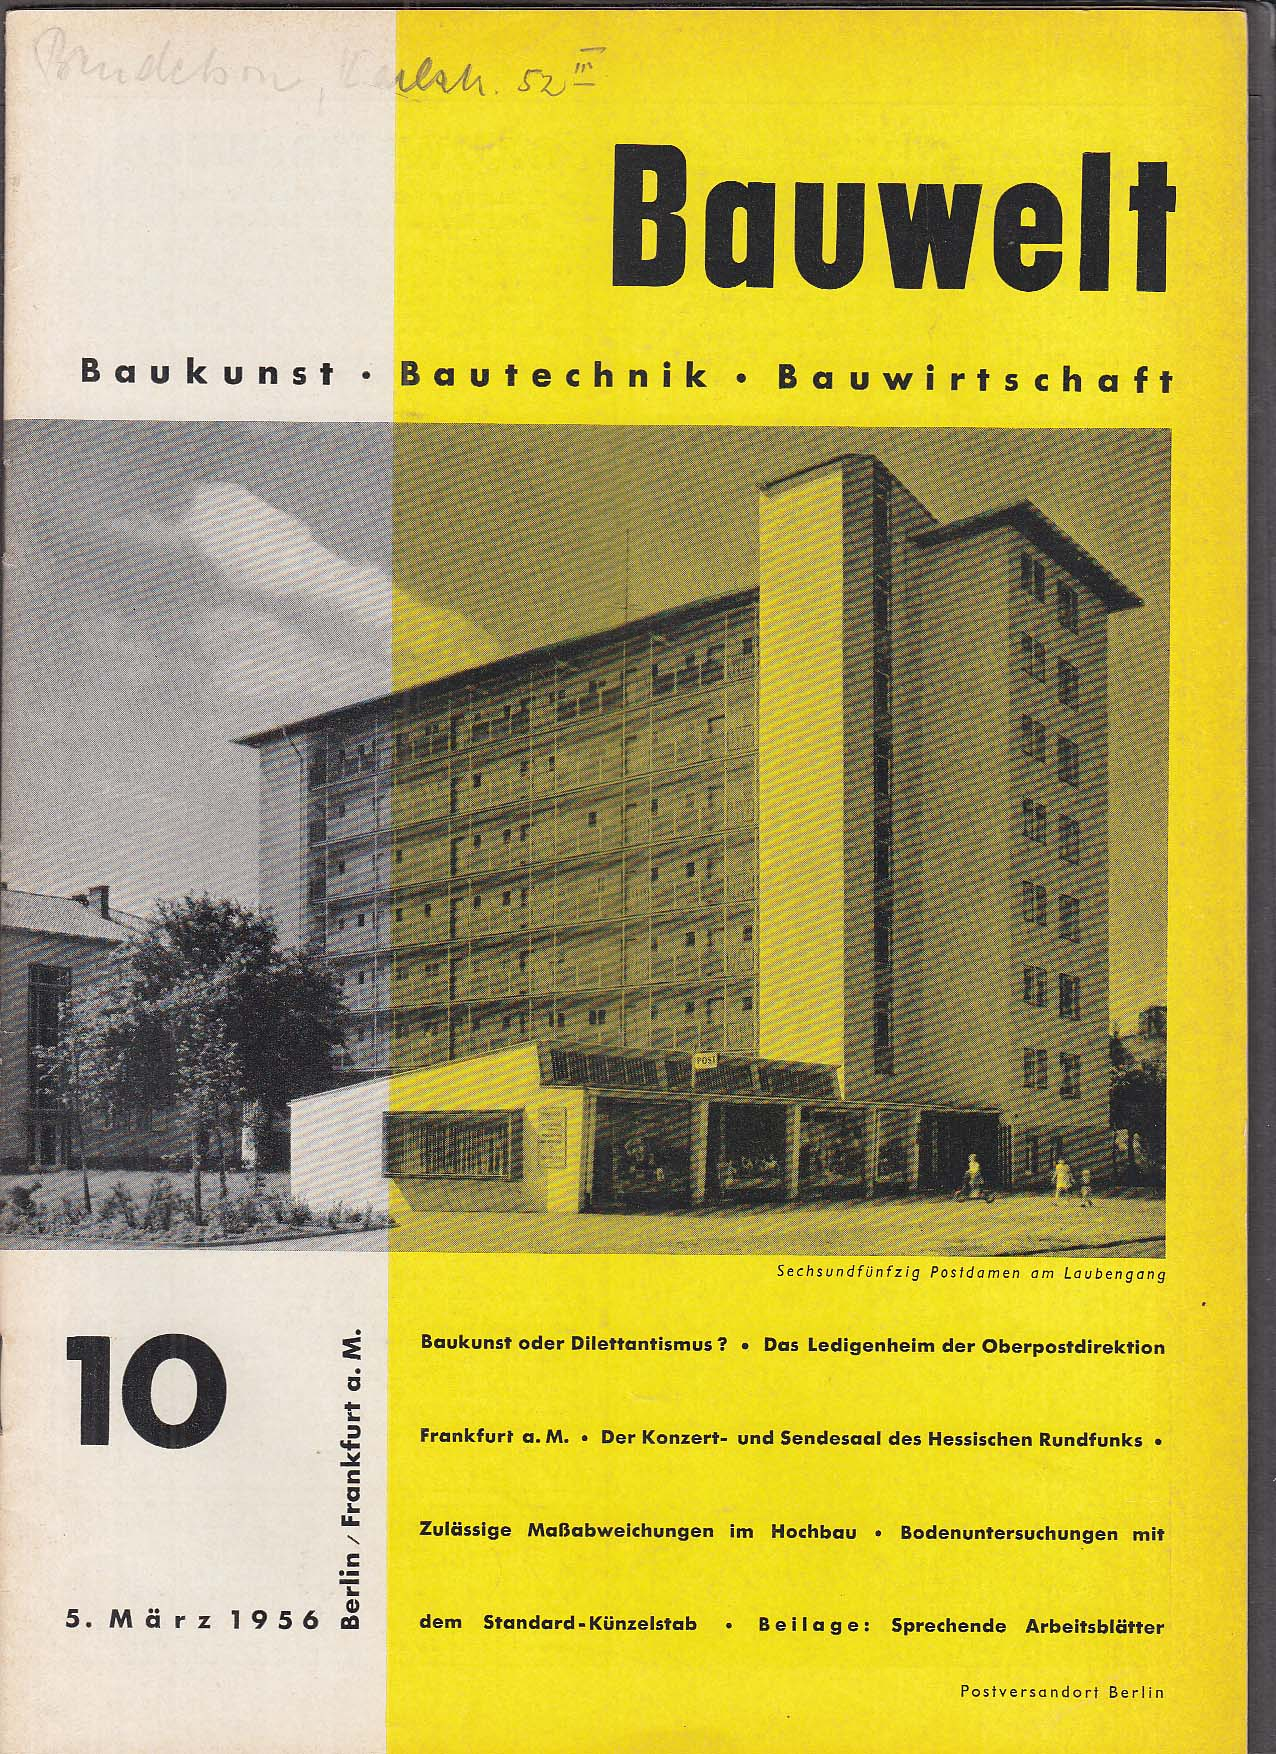 Bauwelt German architecture magazine 3/5/1956 10